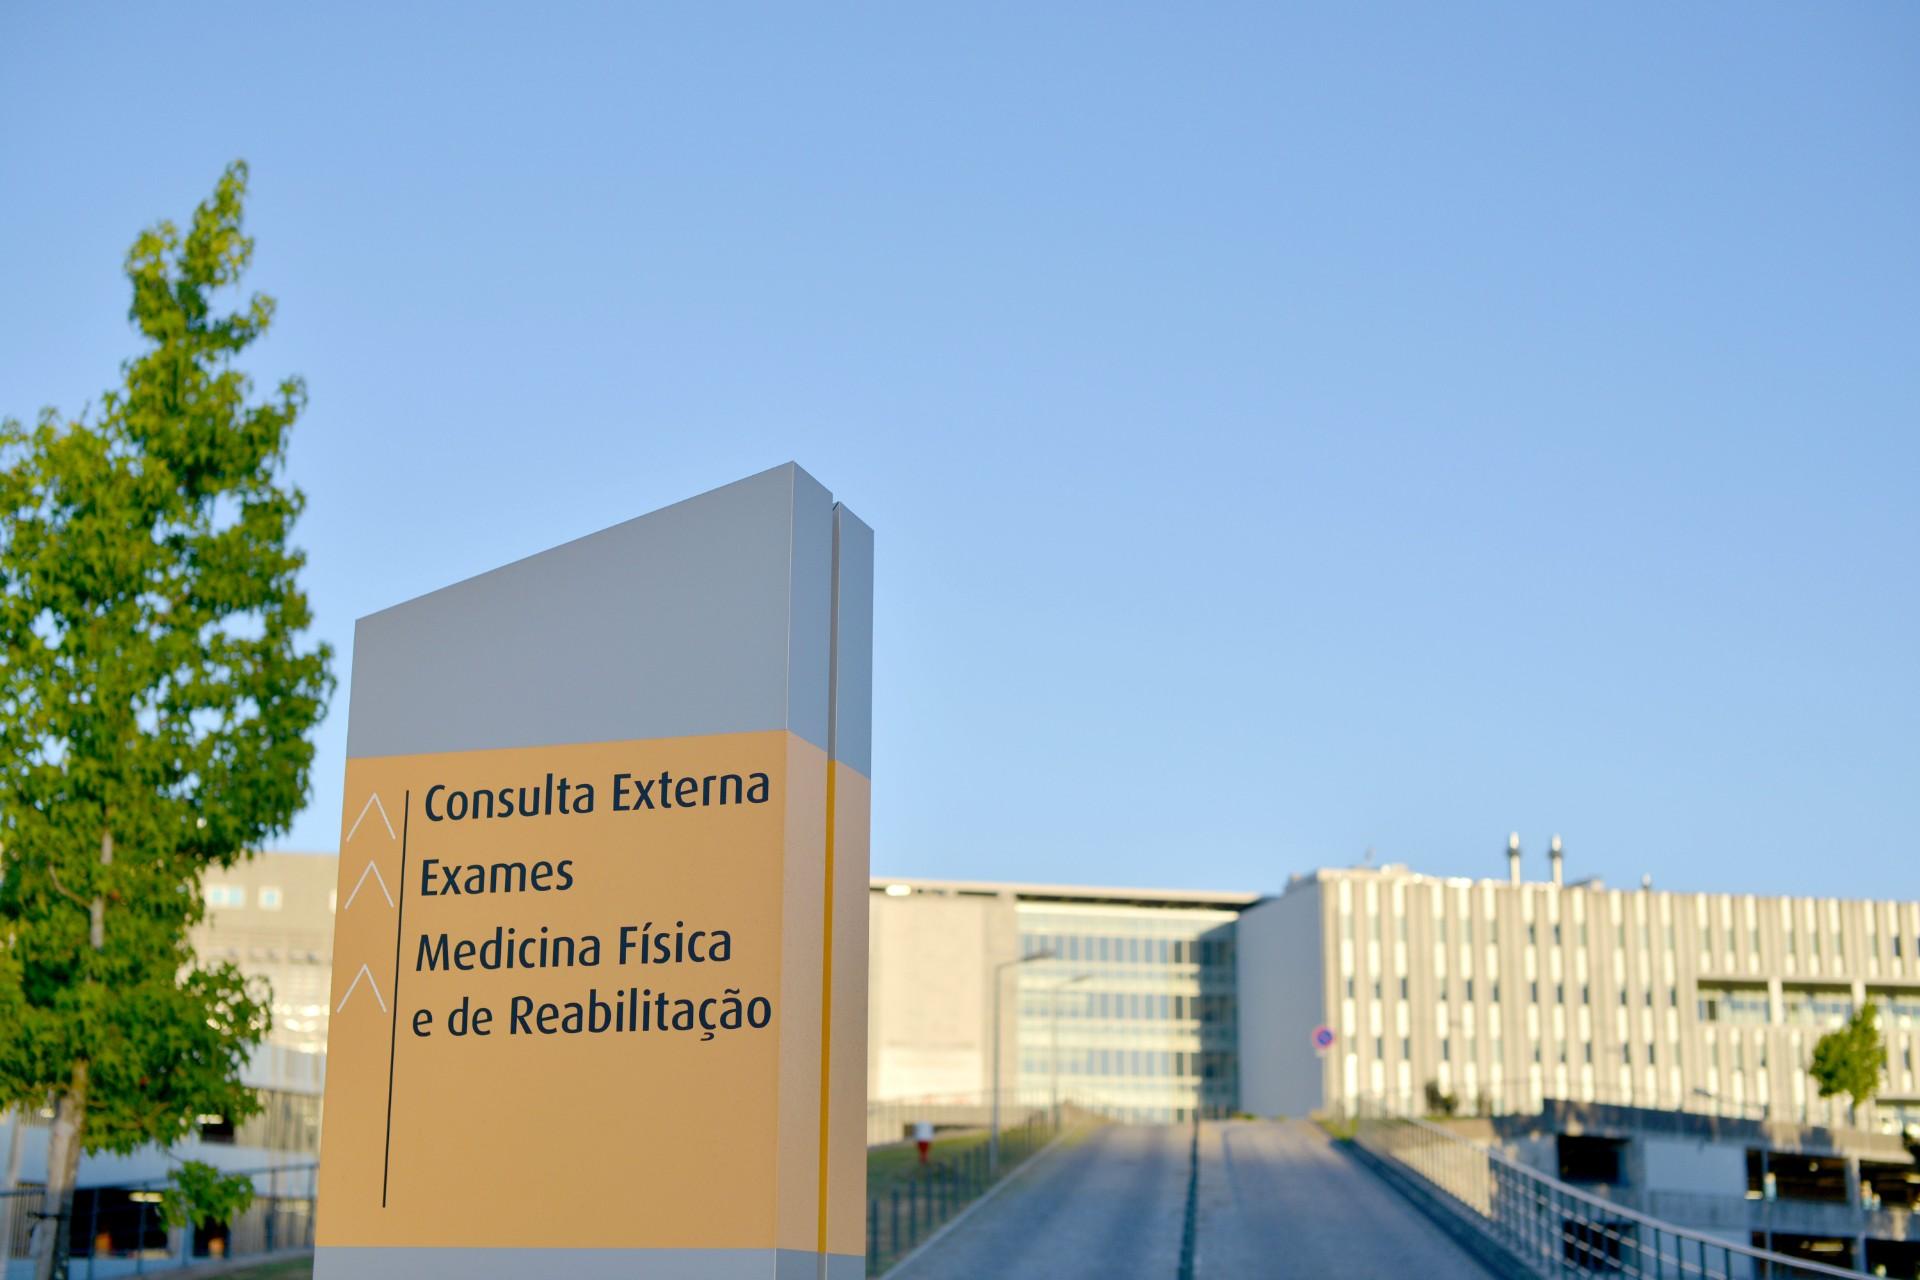 hospital-de-braga-Indicadores positivos na retoma da atividade assistencial programada